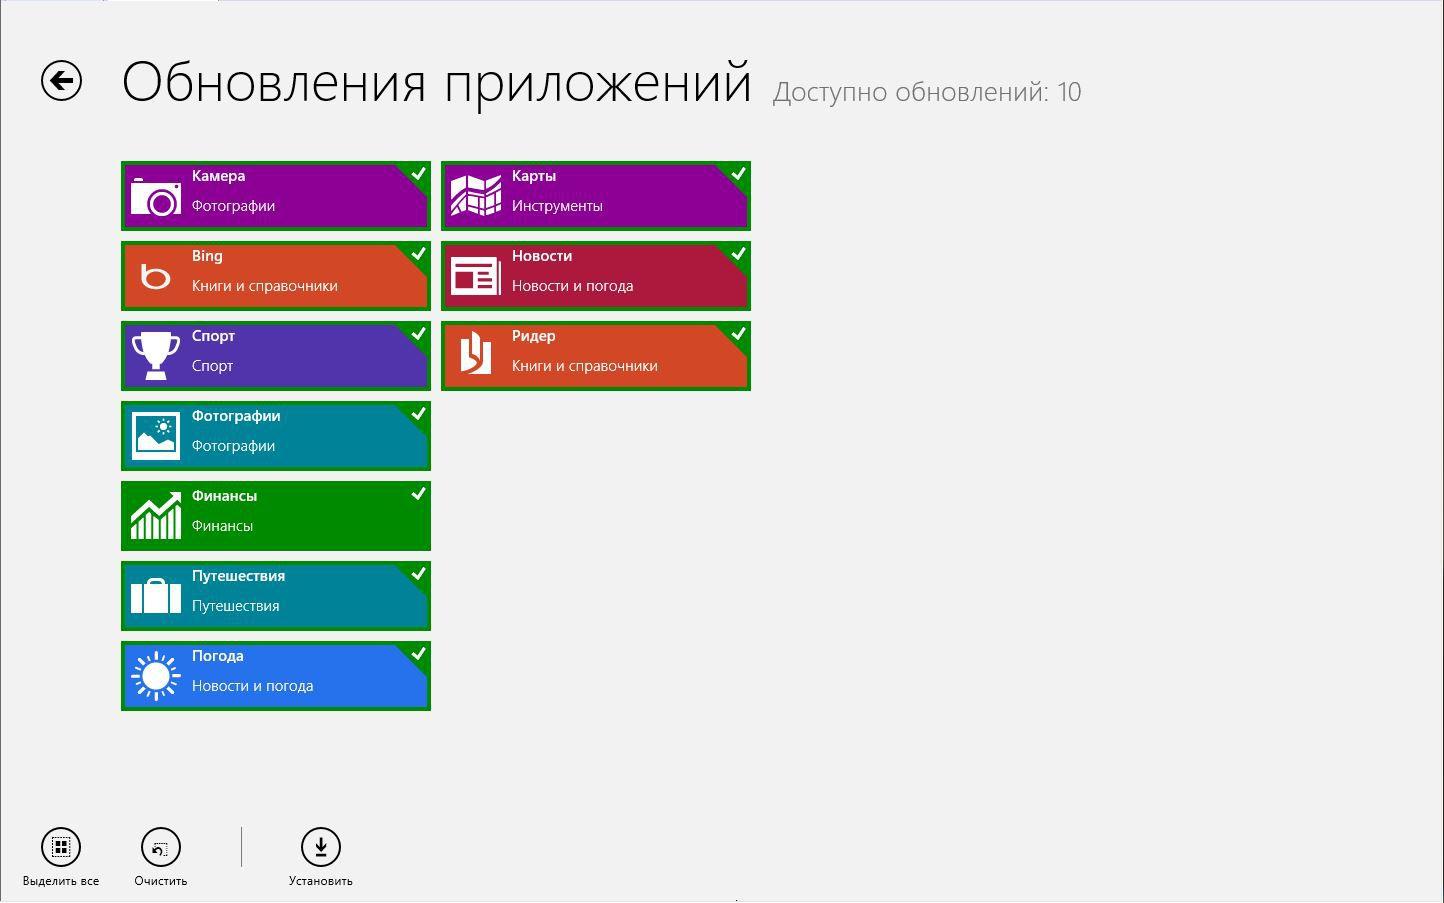 Microsoft Windows 8.0 6.2.9200 Pro VL x86-x64 RU SM 4x1 2